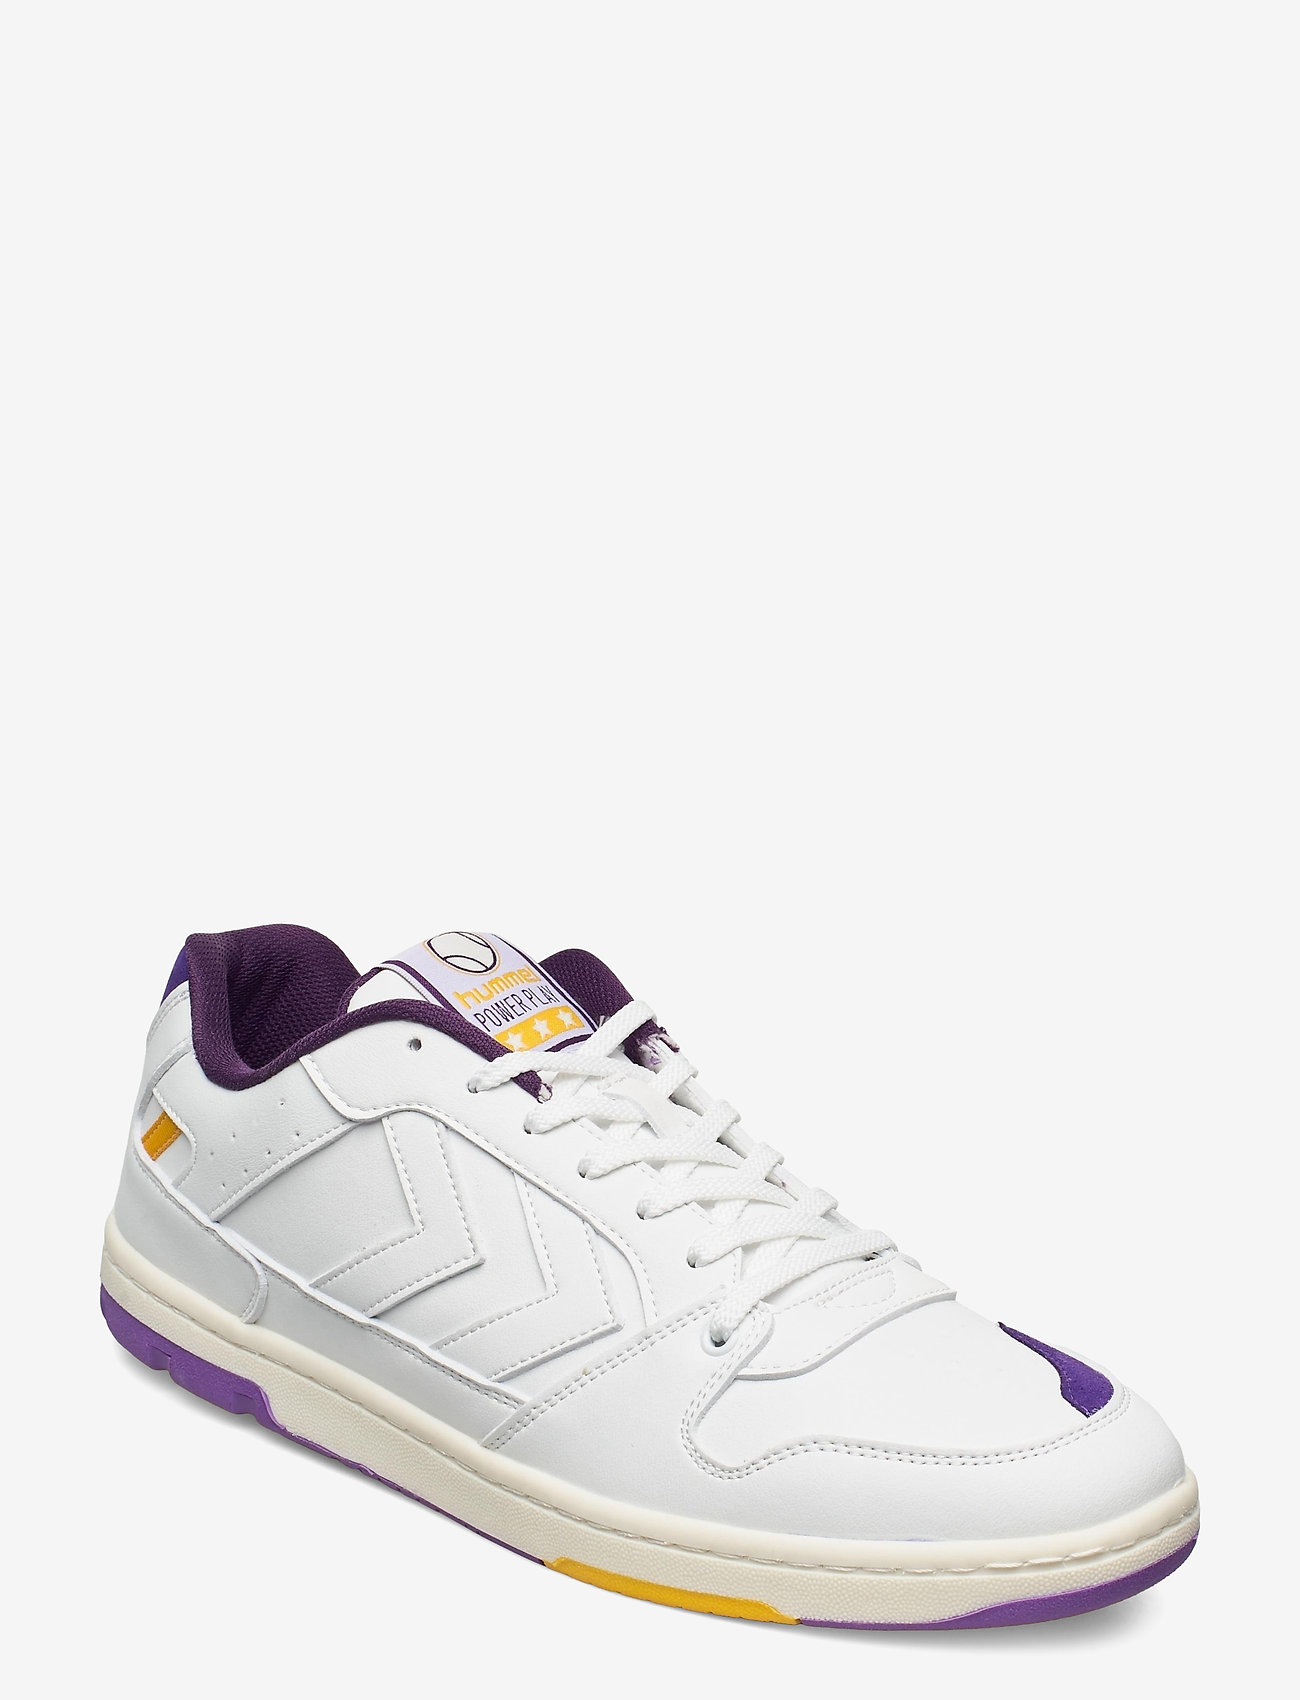 Hummel - POWER PLAY VEGAN ARCHIVE - laag sneakers - white/dahlia purple/geranium - 1